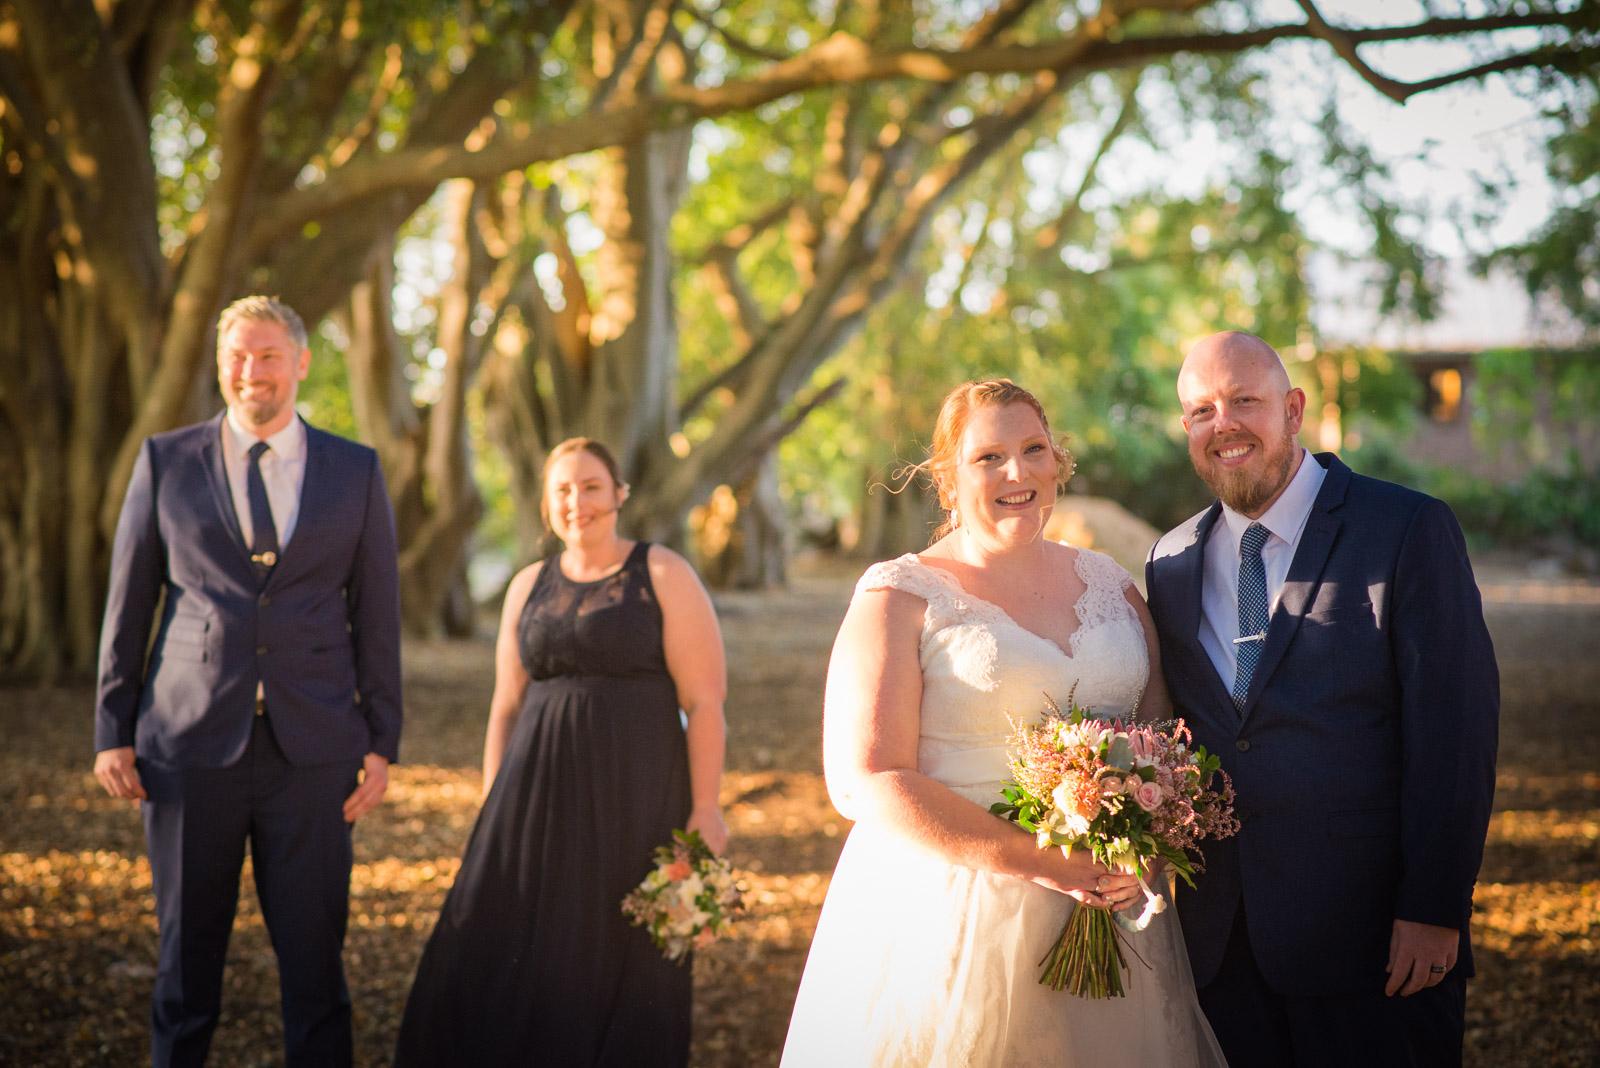 Wedding party at Wirreanda Park in Buderim